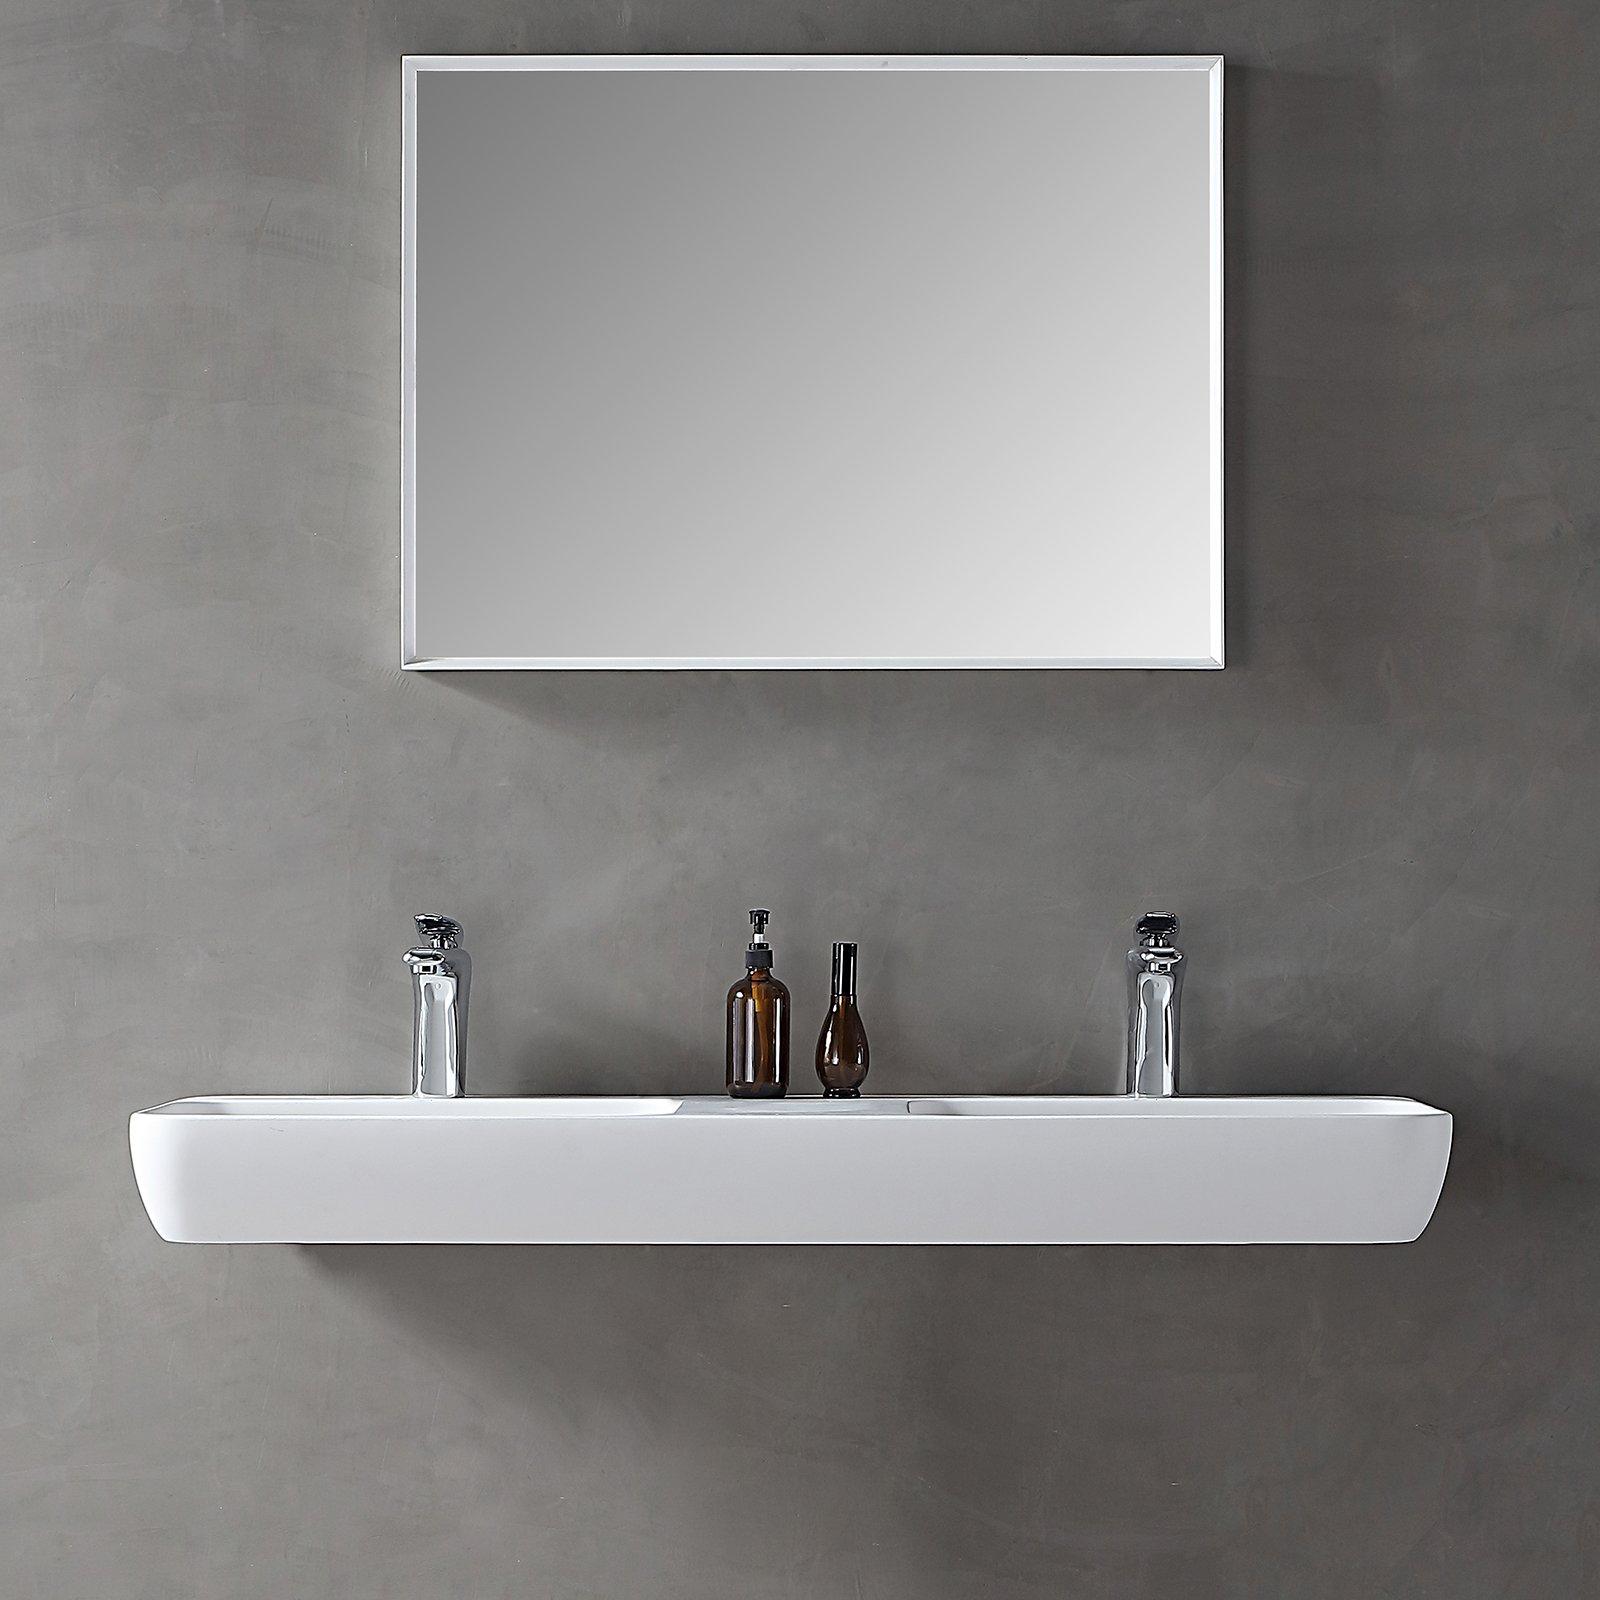 Wandwaschbecken Aufsatzwaschbecken TWG203 aus Mineralguss Solid Stone - Weiß matt - 120x40x12cm zoom thumbnail 4